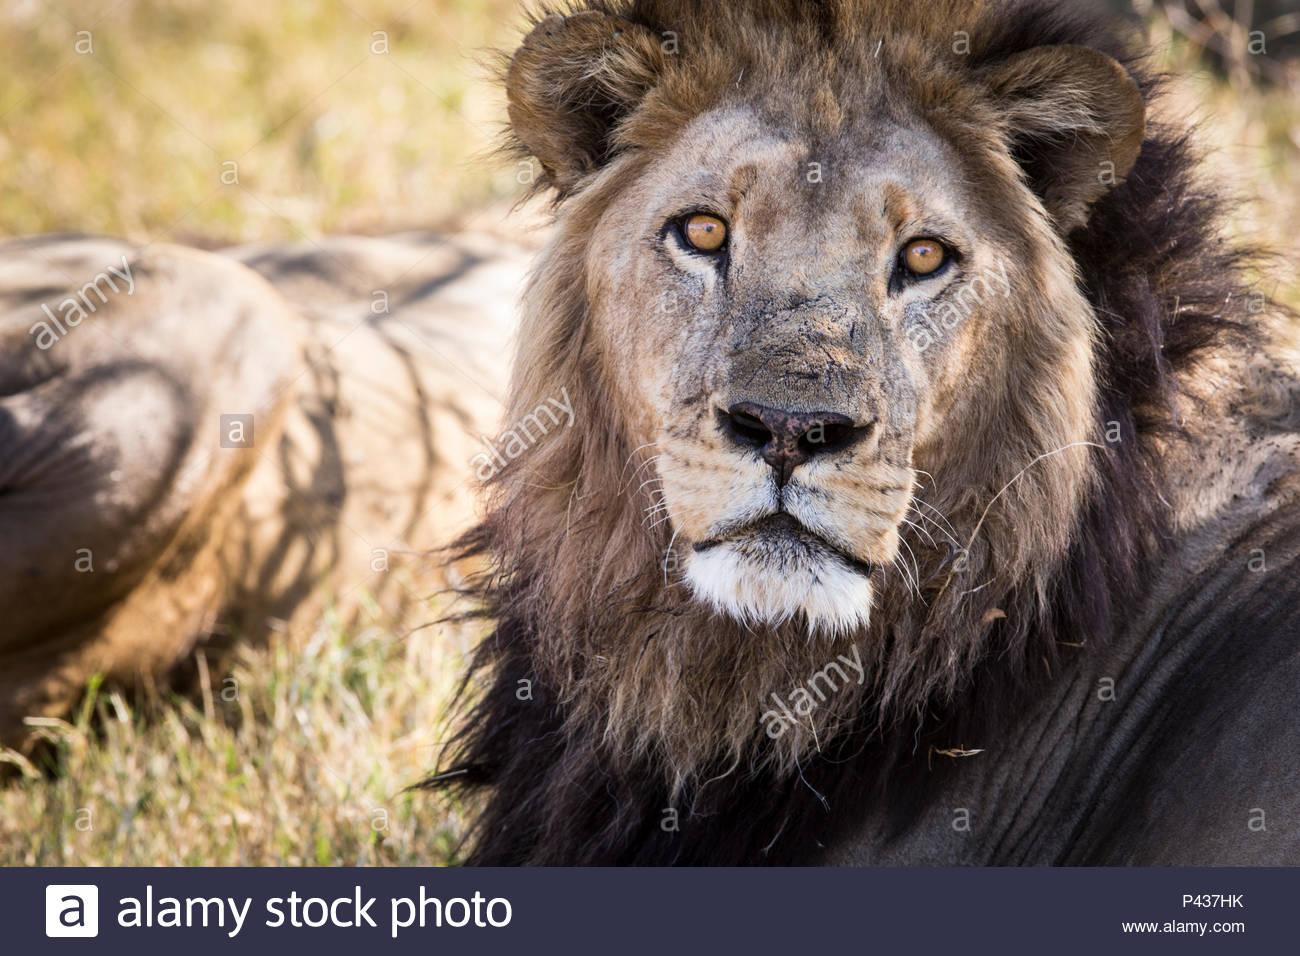 A lion in the grasslands of the Okavango Delta. - Stock Image